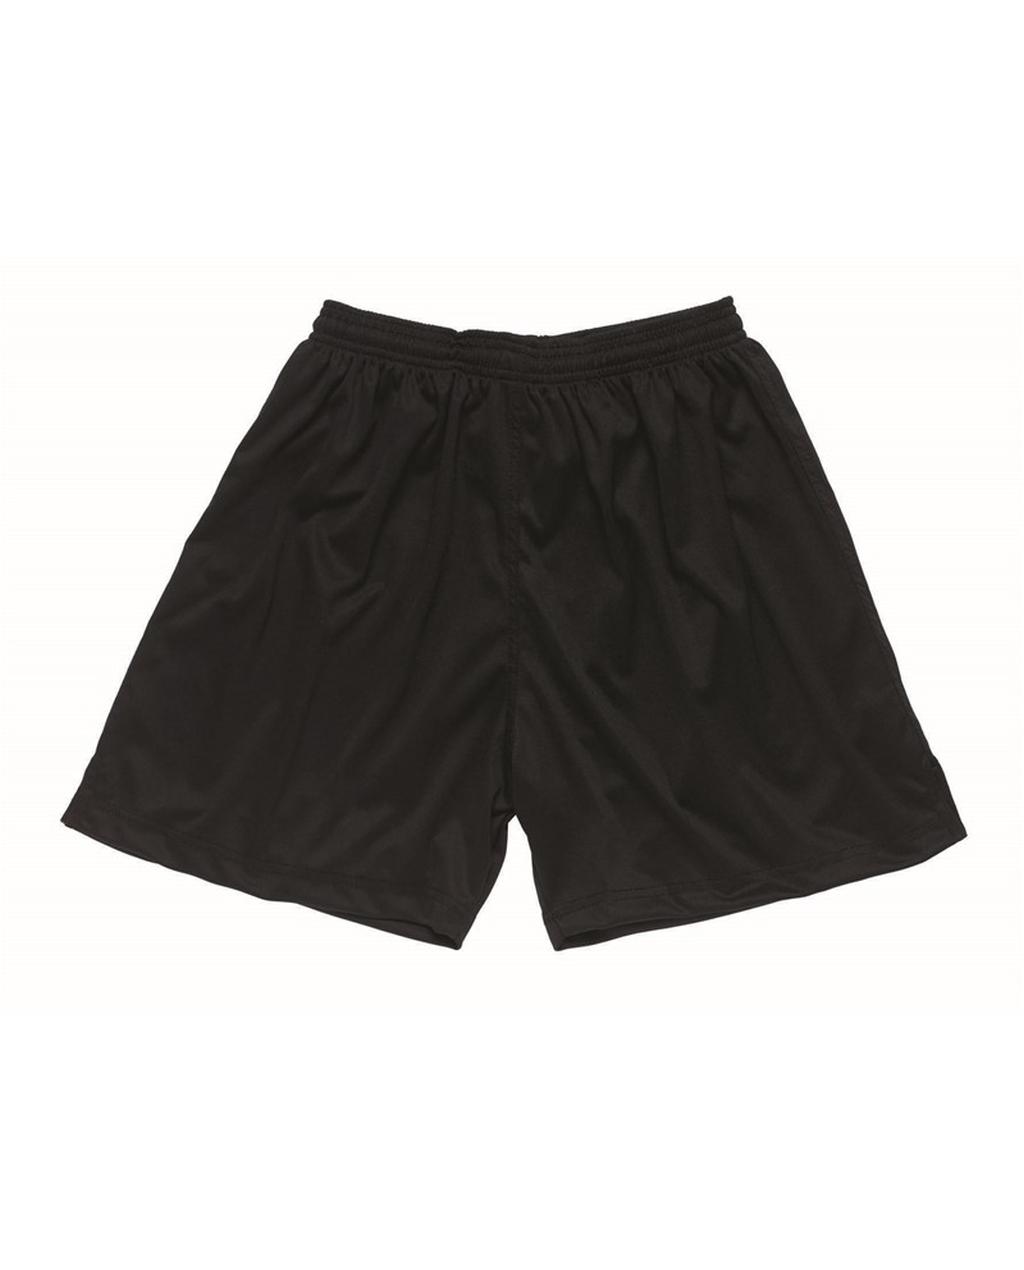 Sports Shorts - 22/24